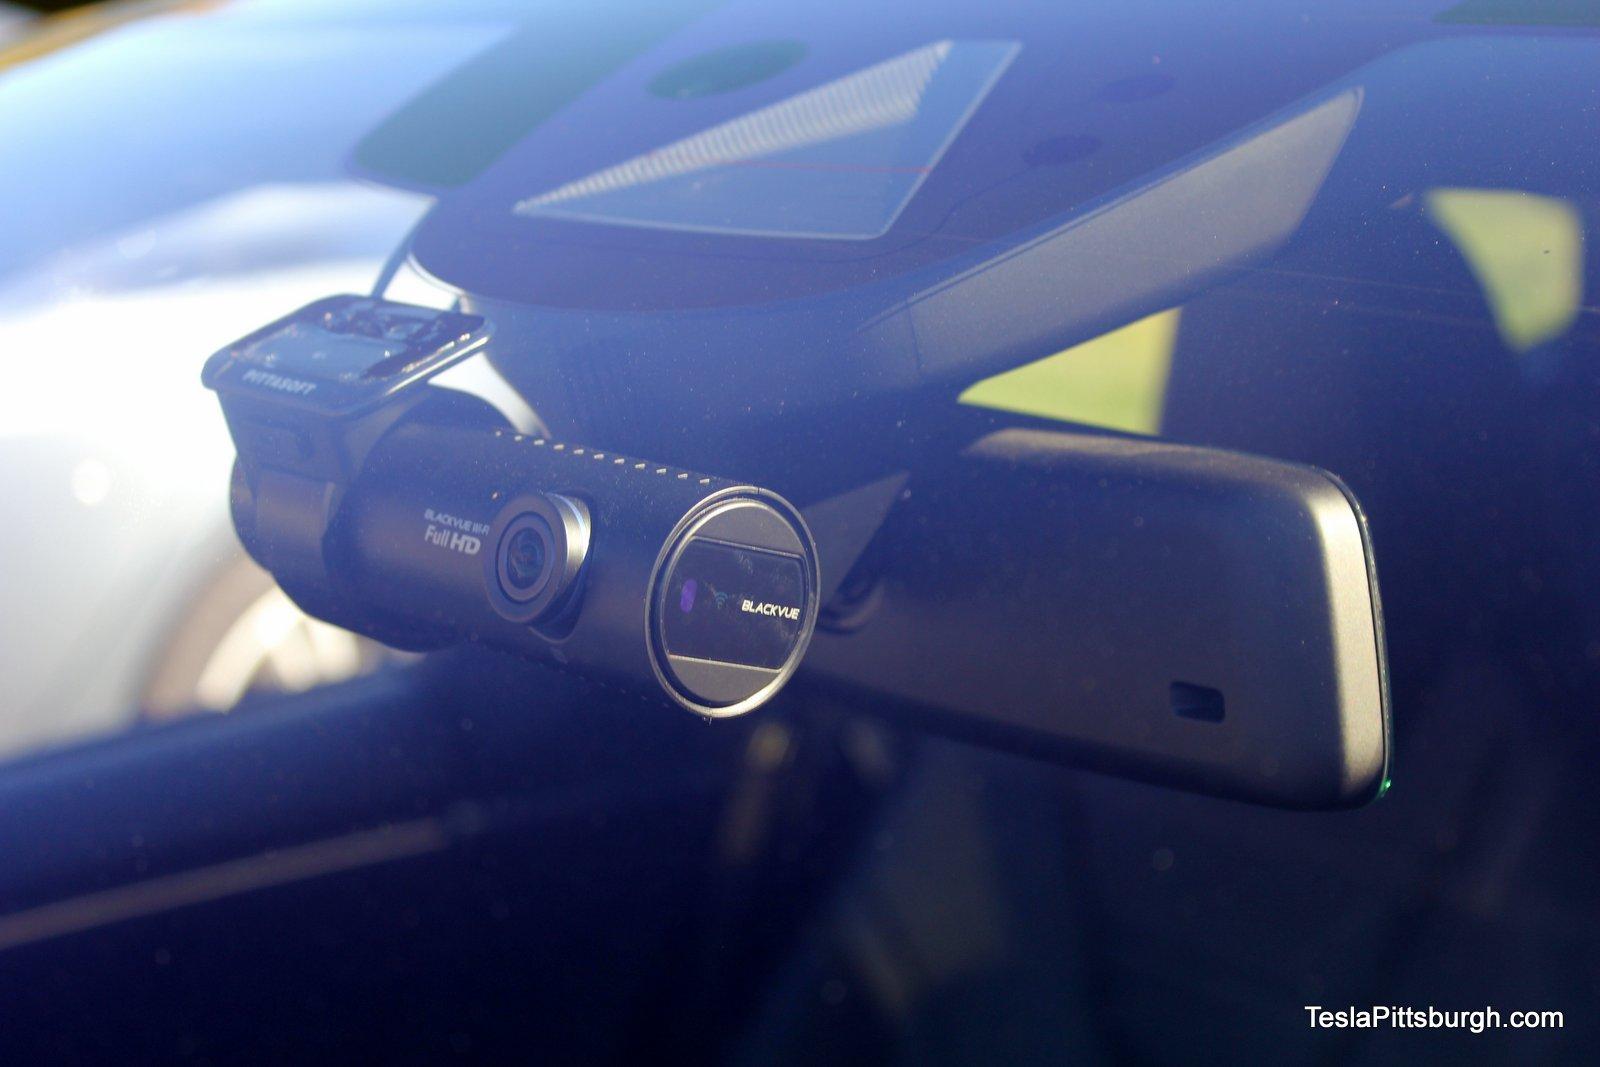 tesla-pittsburgh-review-blackvue-windshield-dashcam-camera